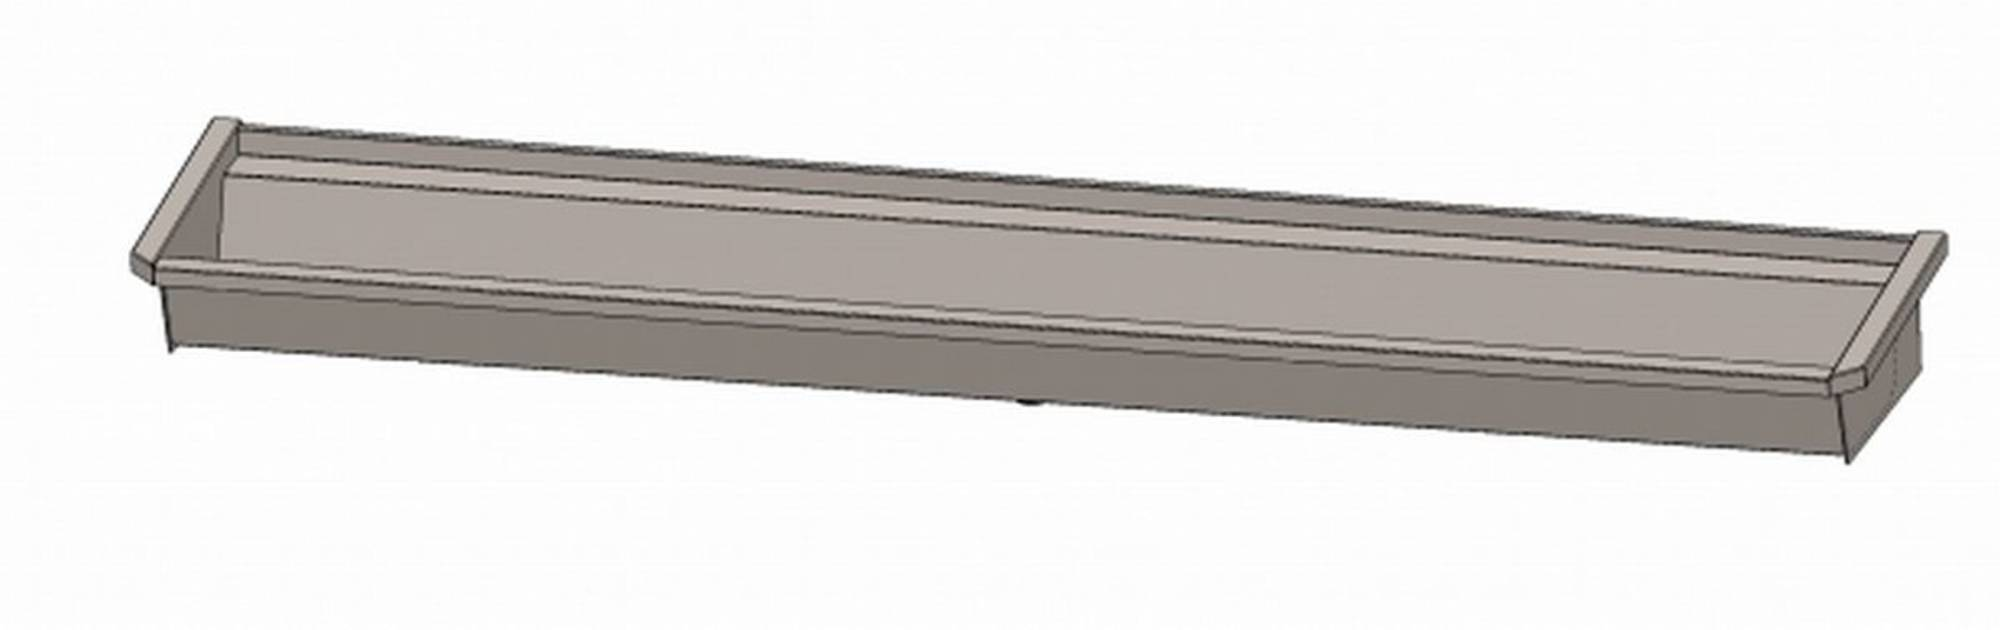 INTERSAN SANILAV wasgoot 240cm.4 pers.zonder leiding zonder kranen INOX 304 (504Z1)